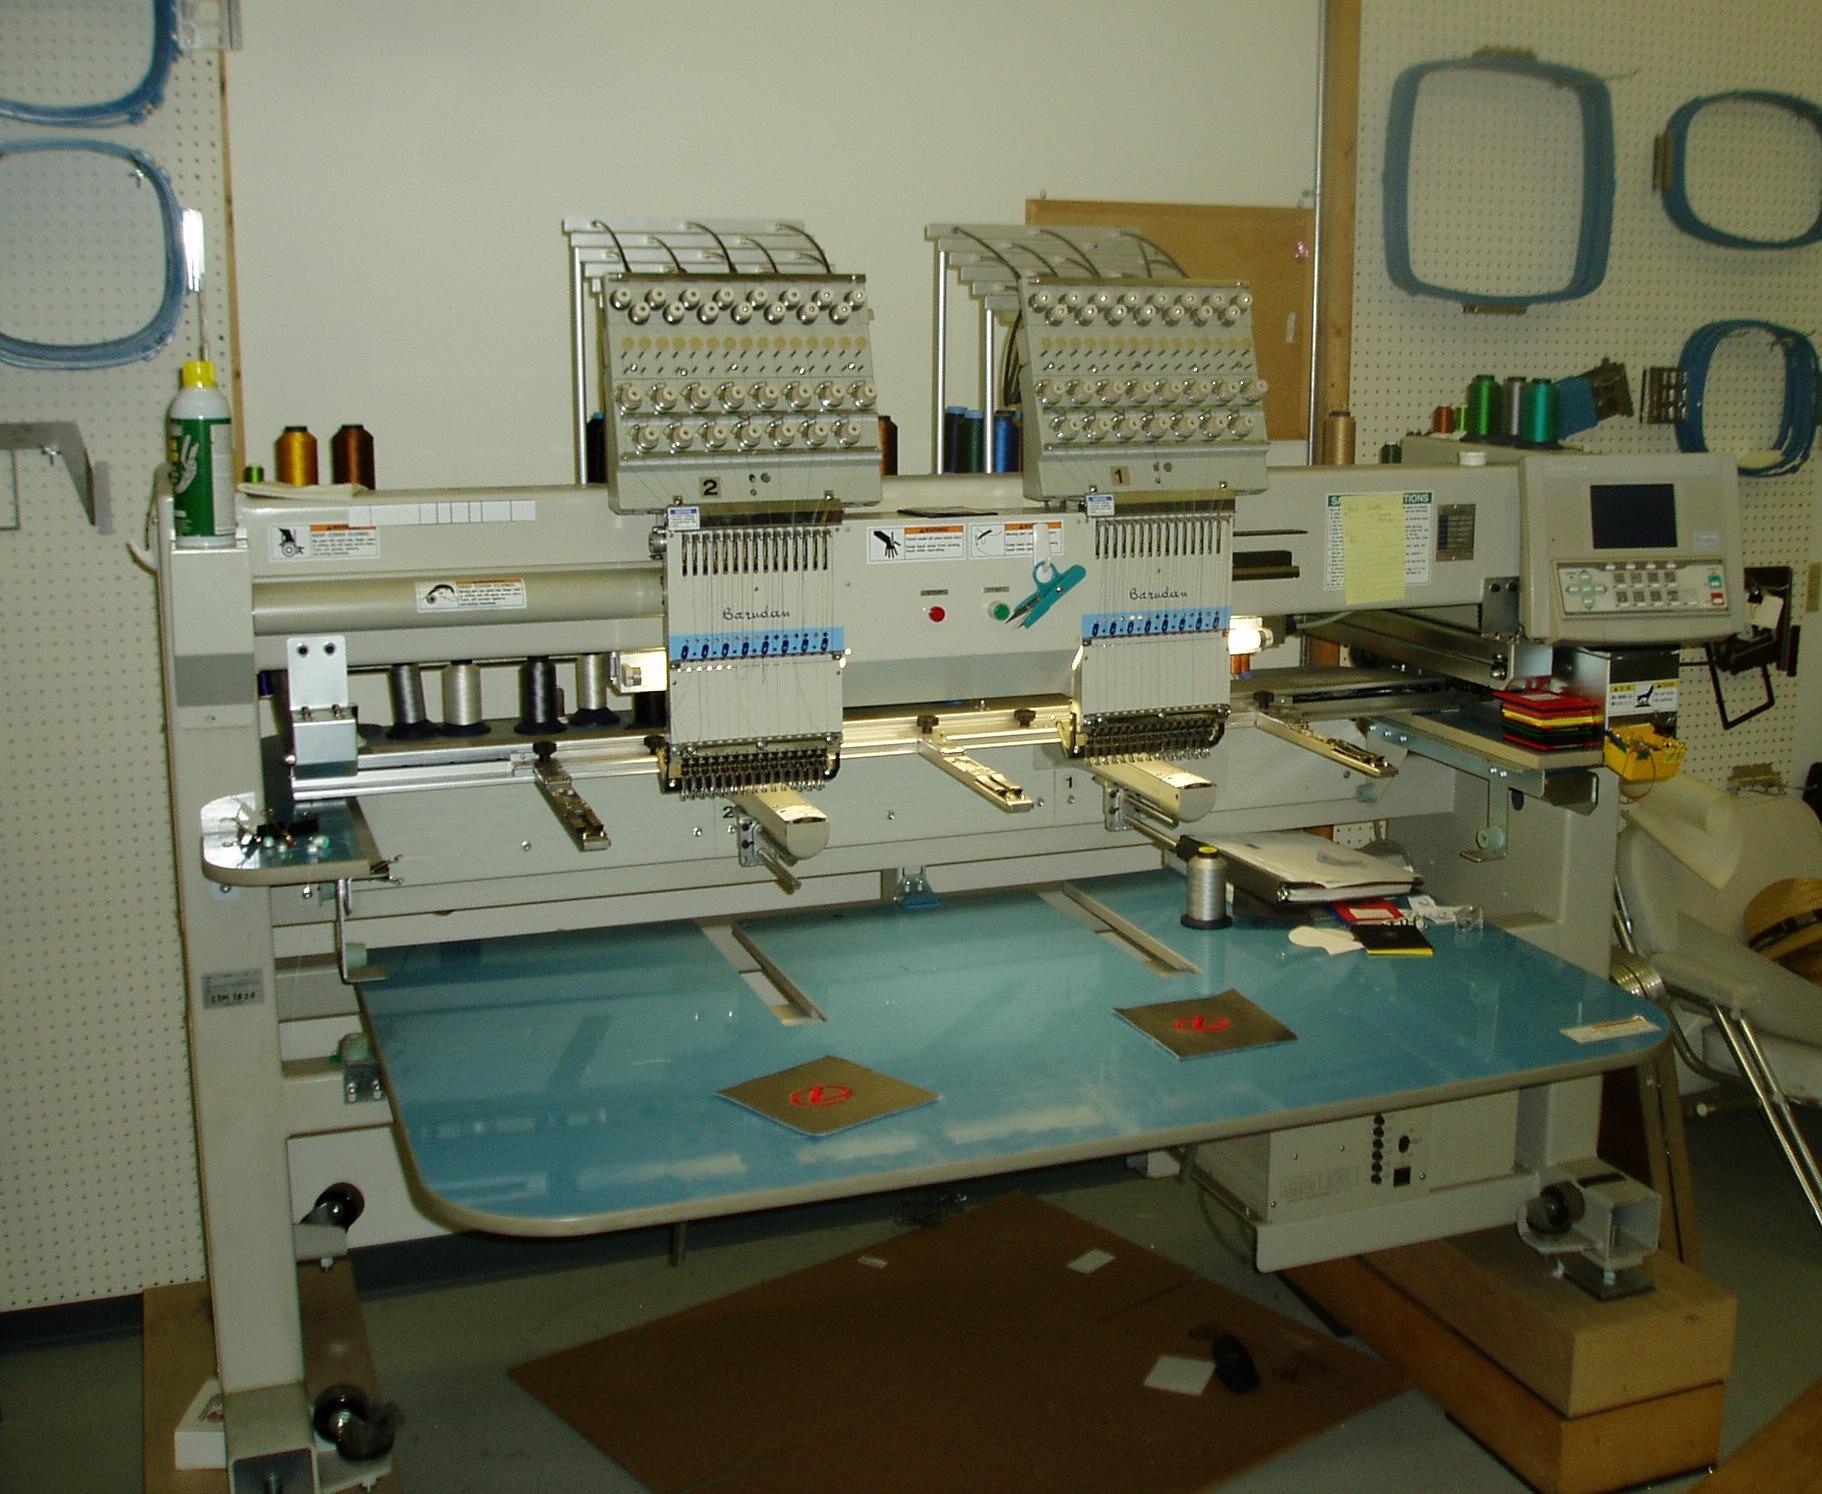 2001 Barudan 8 Head And 2 Head Embroidery Machines